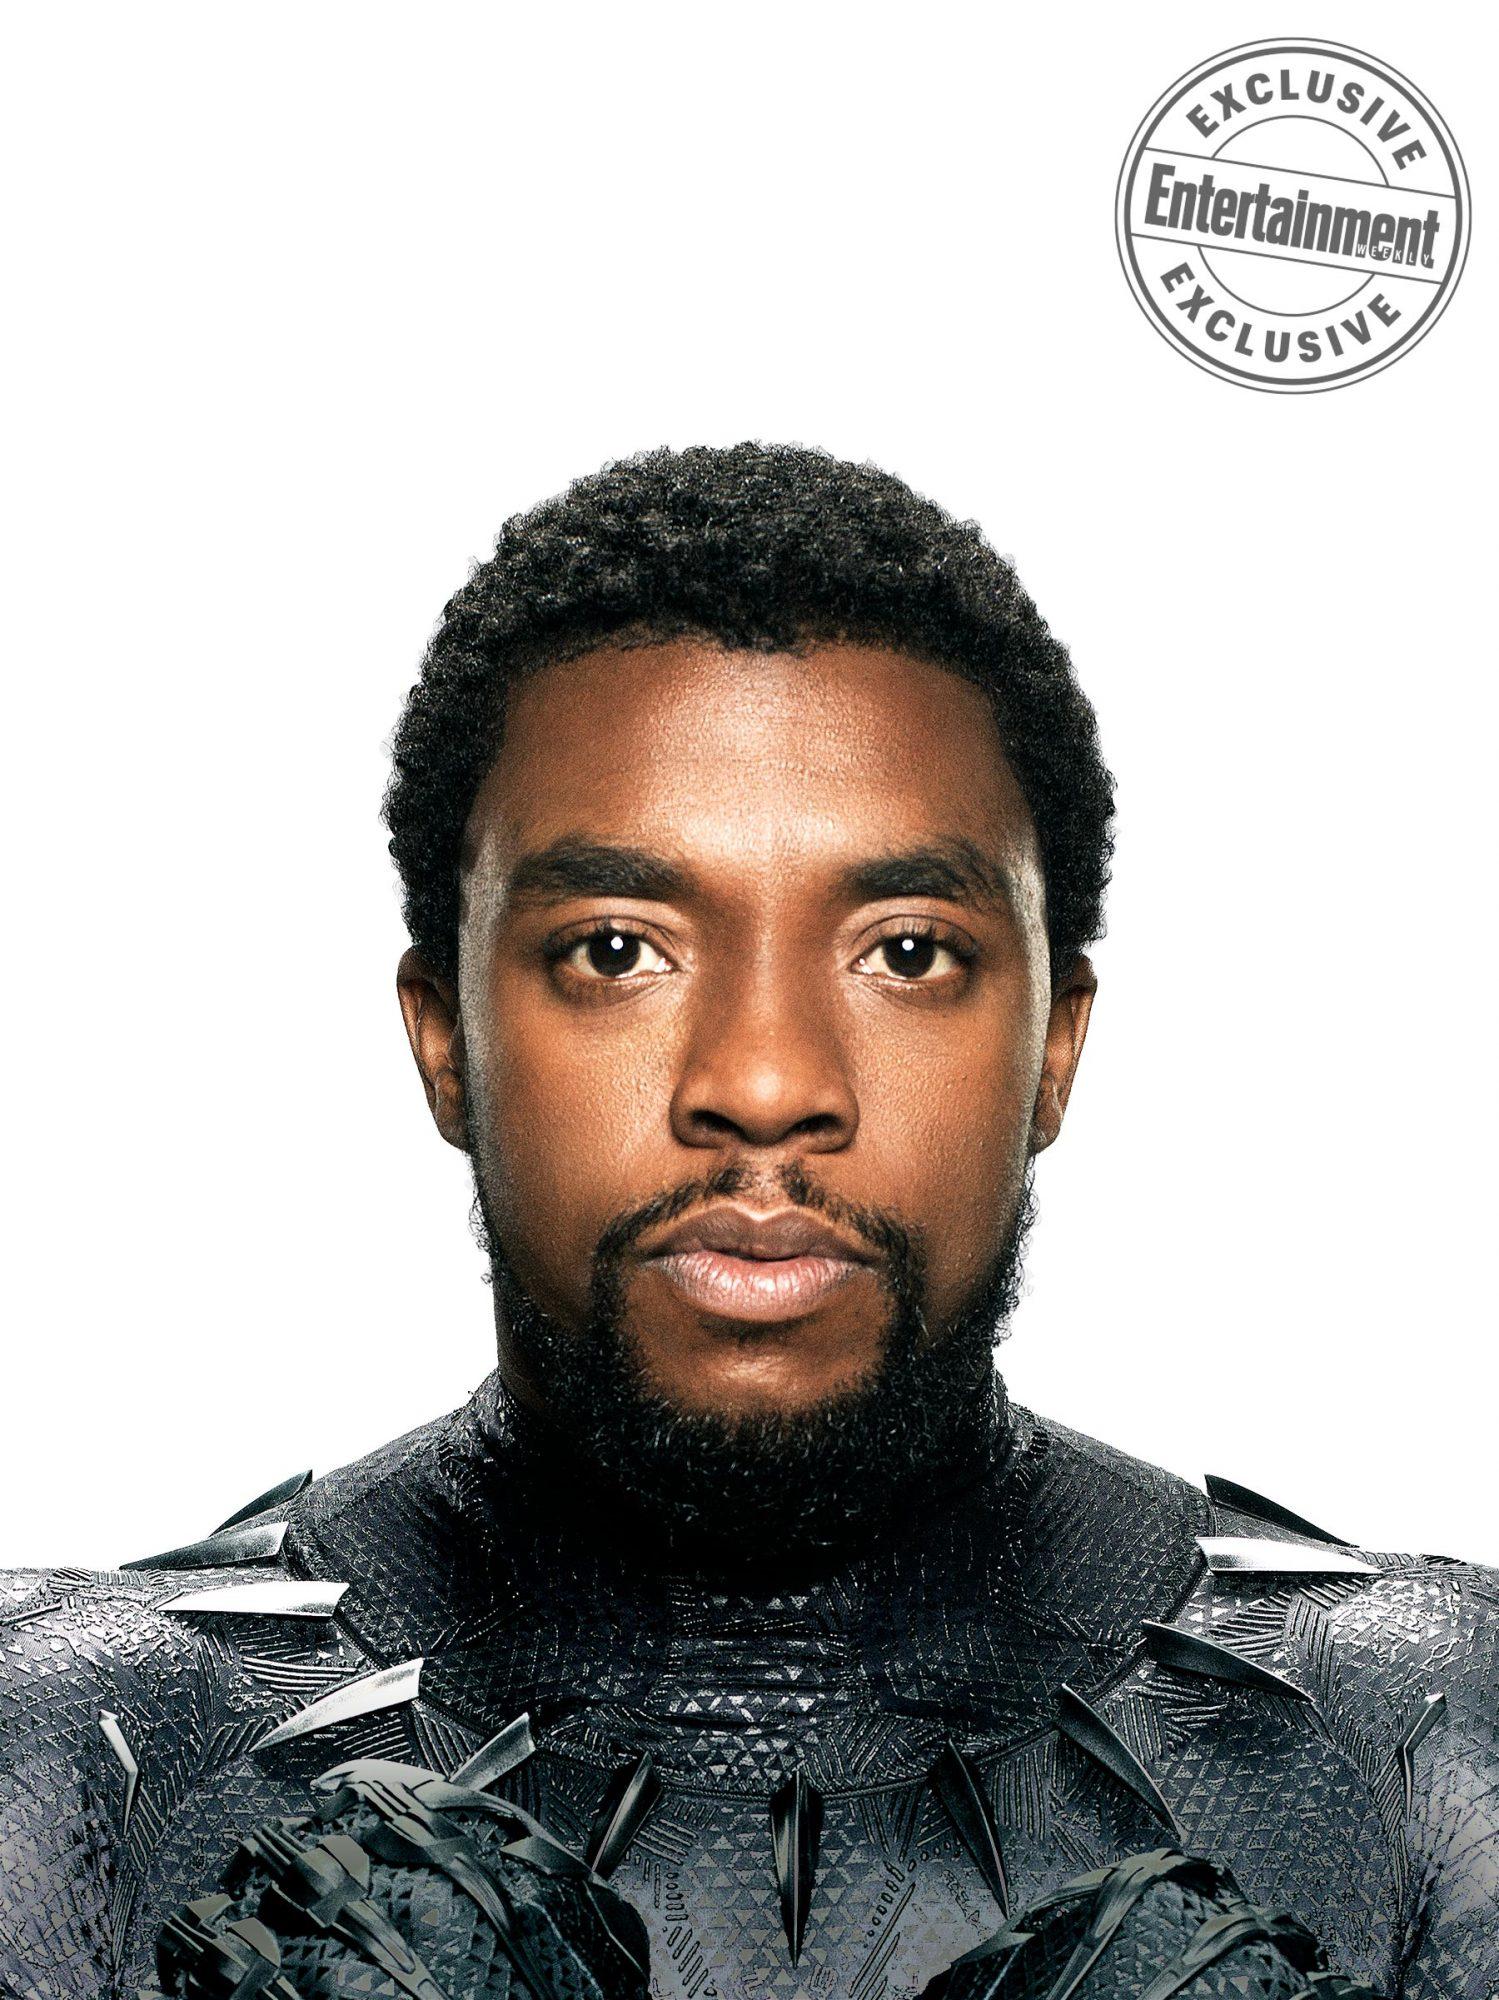 'Black Panther' film premiere, Arrivals, Los Angeles, USA - 29 Jan 2018